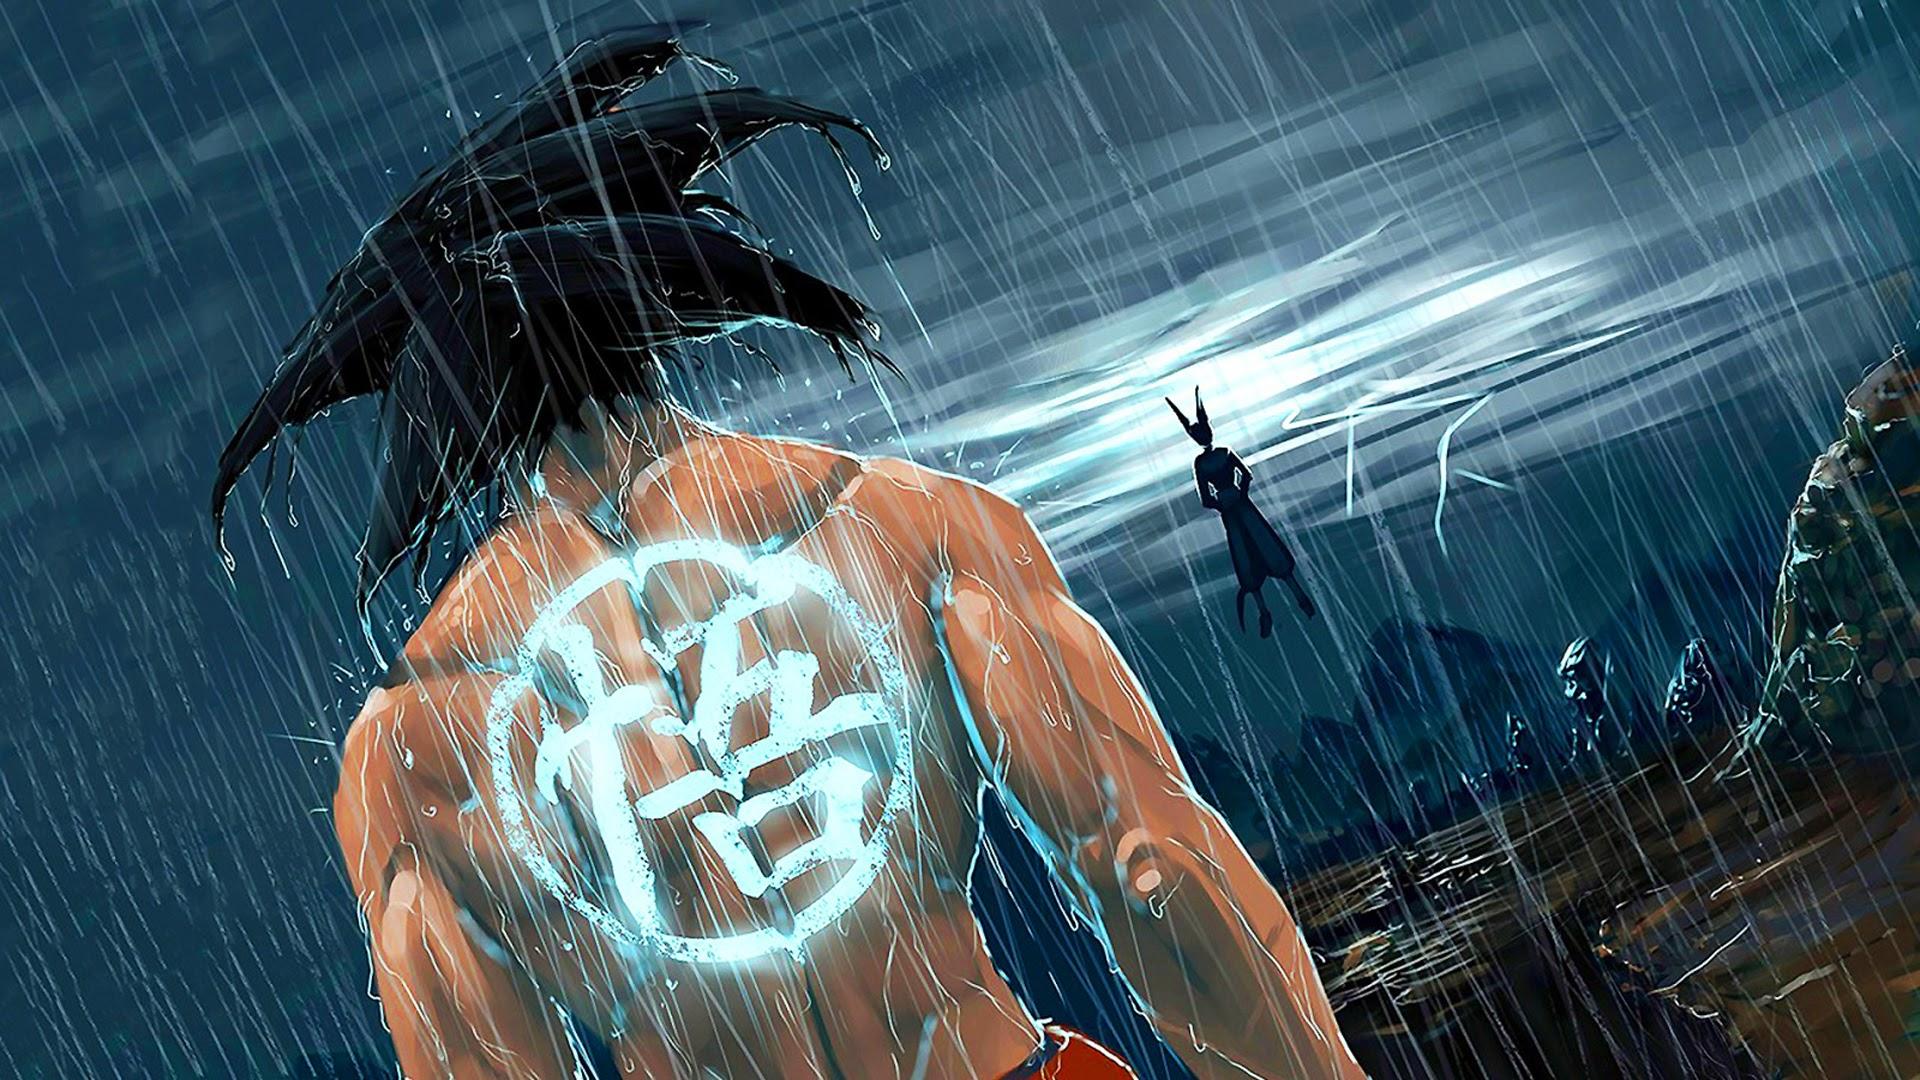 Son Goku Dragon Ball Battle Of Gods Hd Wallpapers 1920x1080